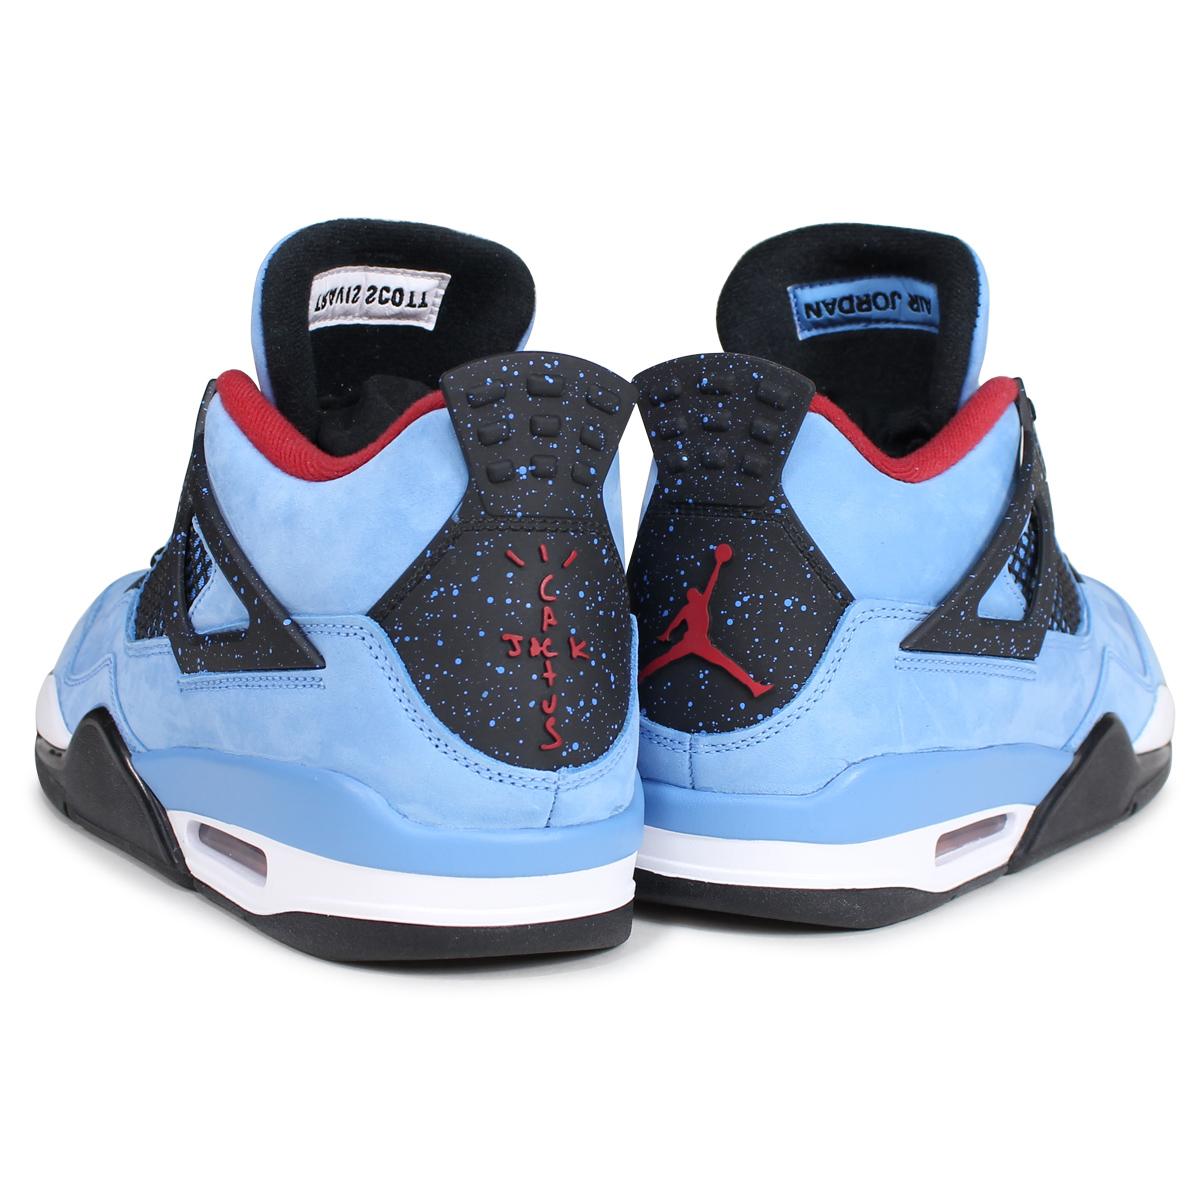 hot sale online adda1 e9405 NIKE AIR JORDAN 4 RETRO TRAVIS SCOTT Nike Air Jordan 4 sneakers 308,497-406  blue [187]